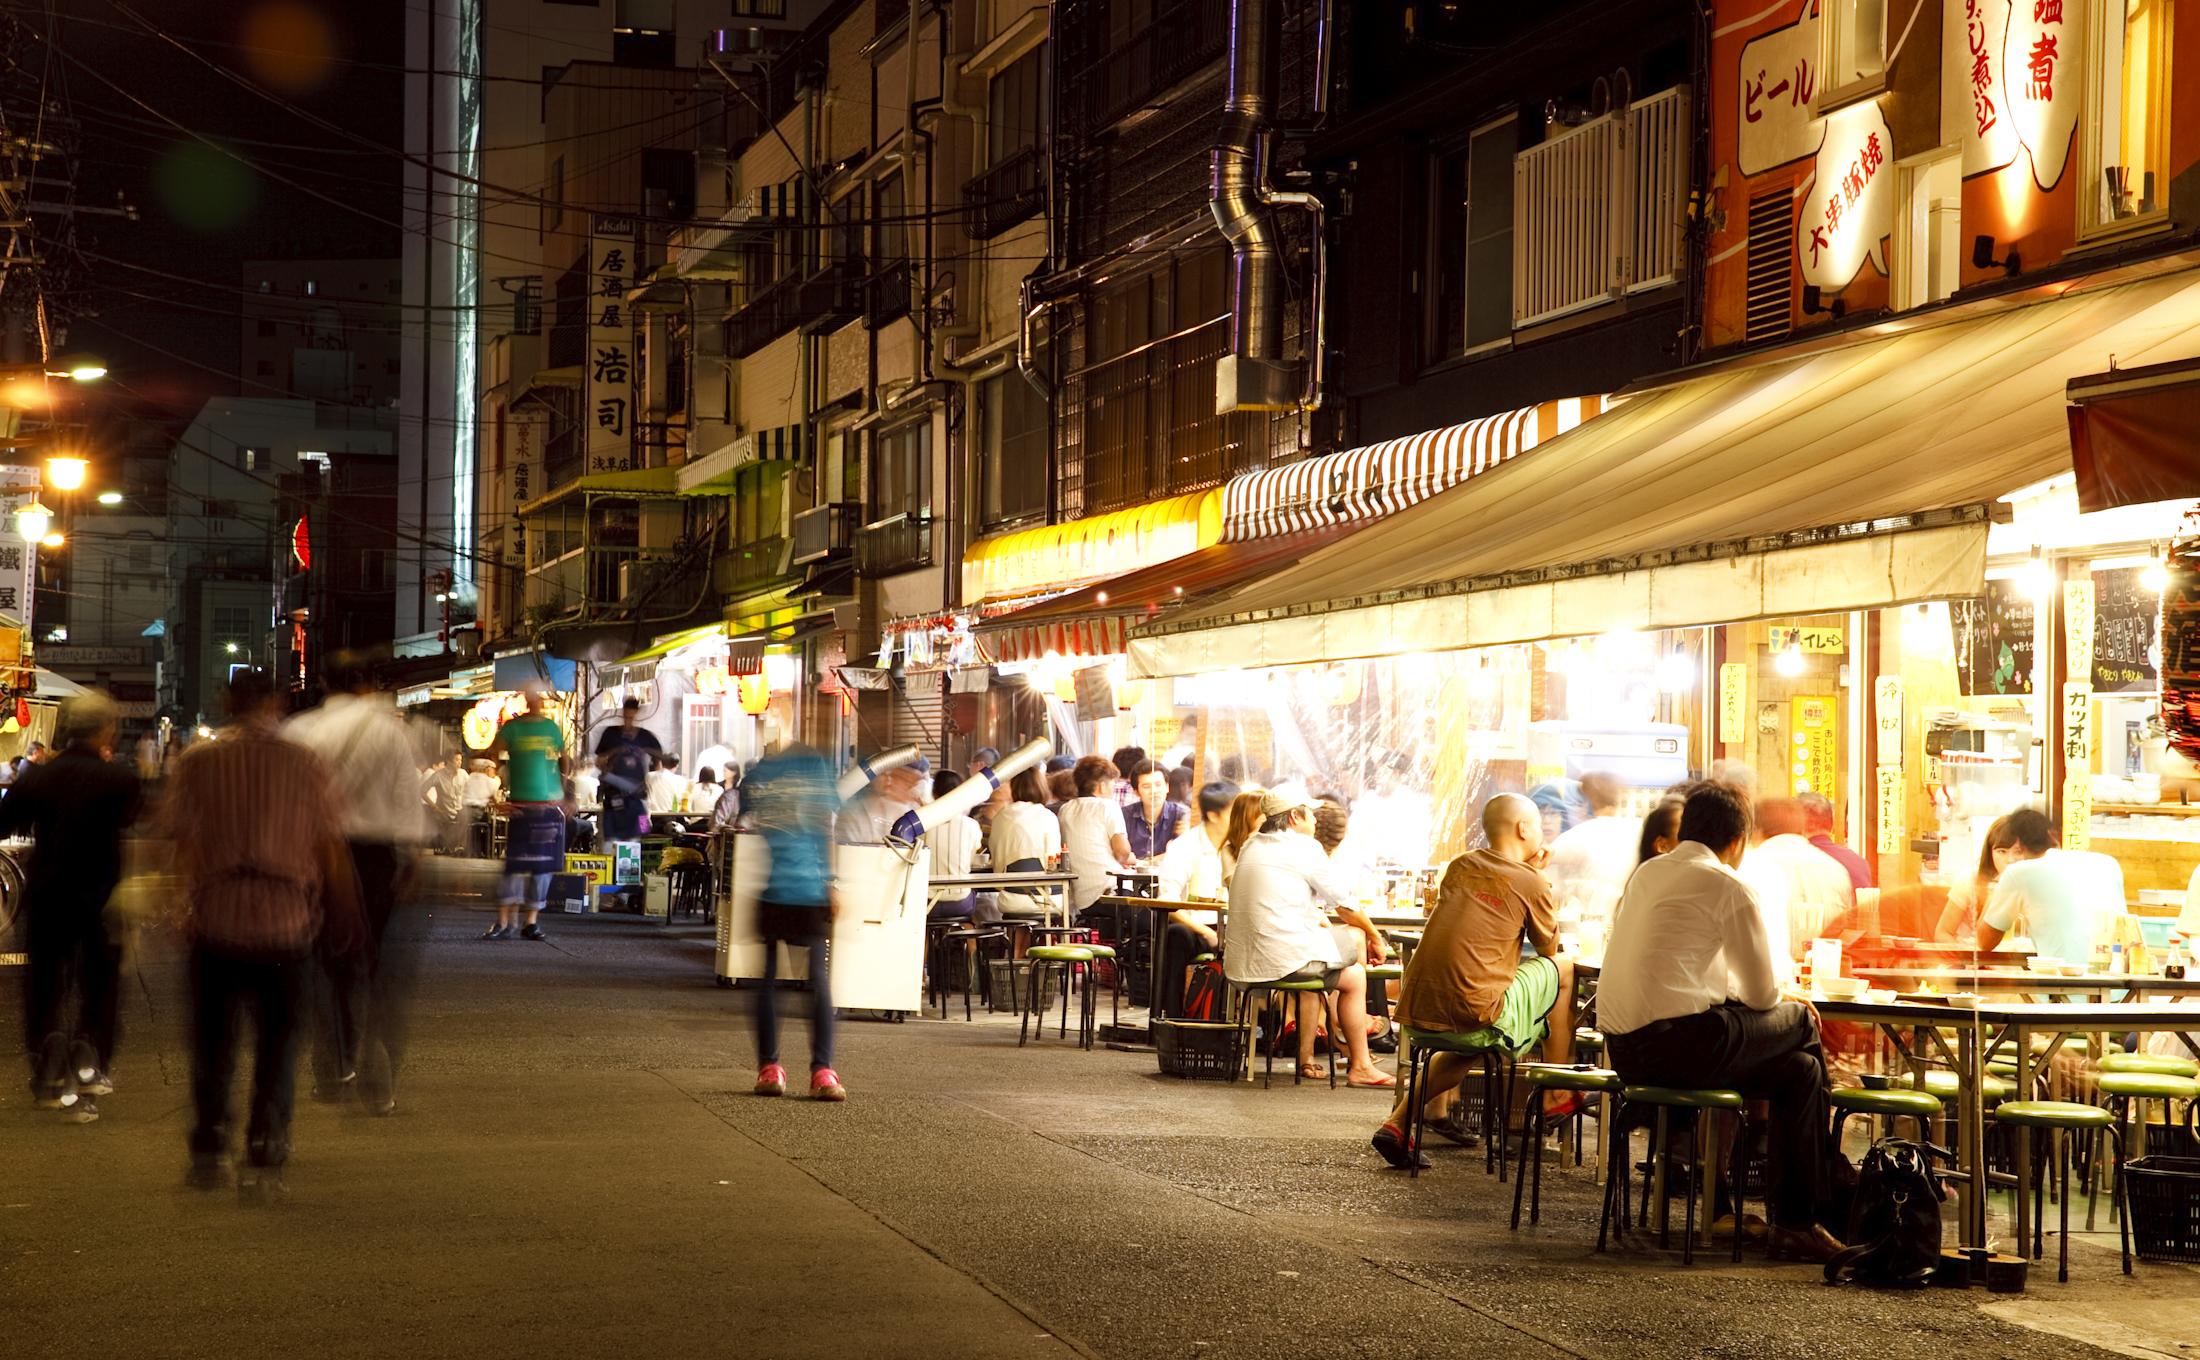 65 Things To Do In Asakusa Asakusa Time Out Tokyo Tokyo